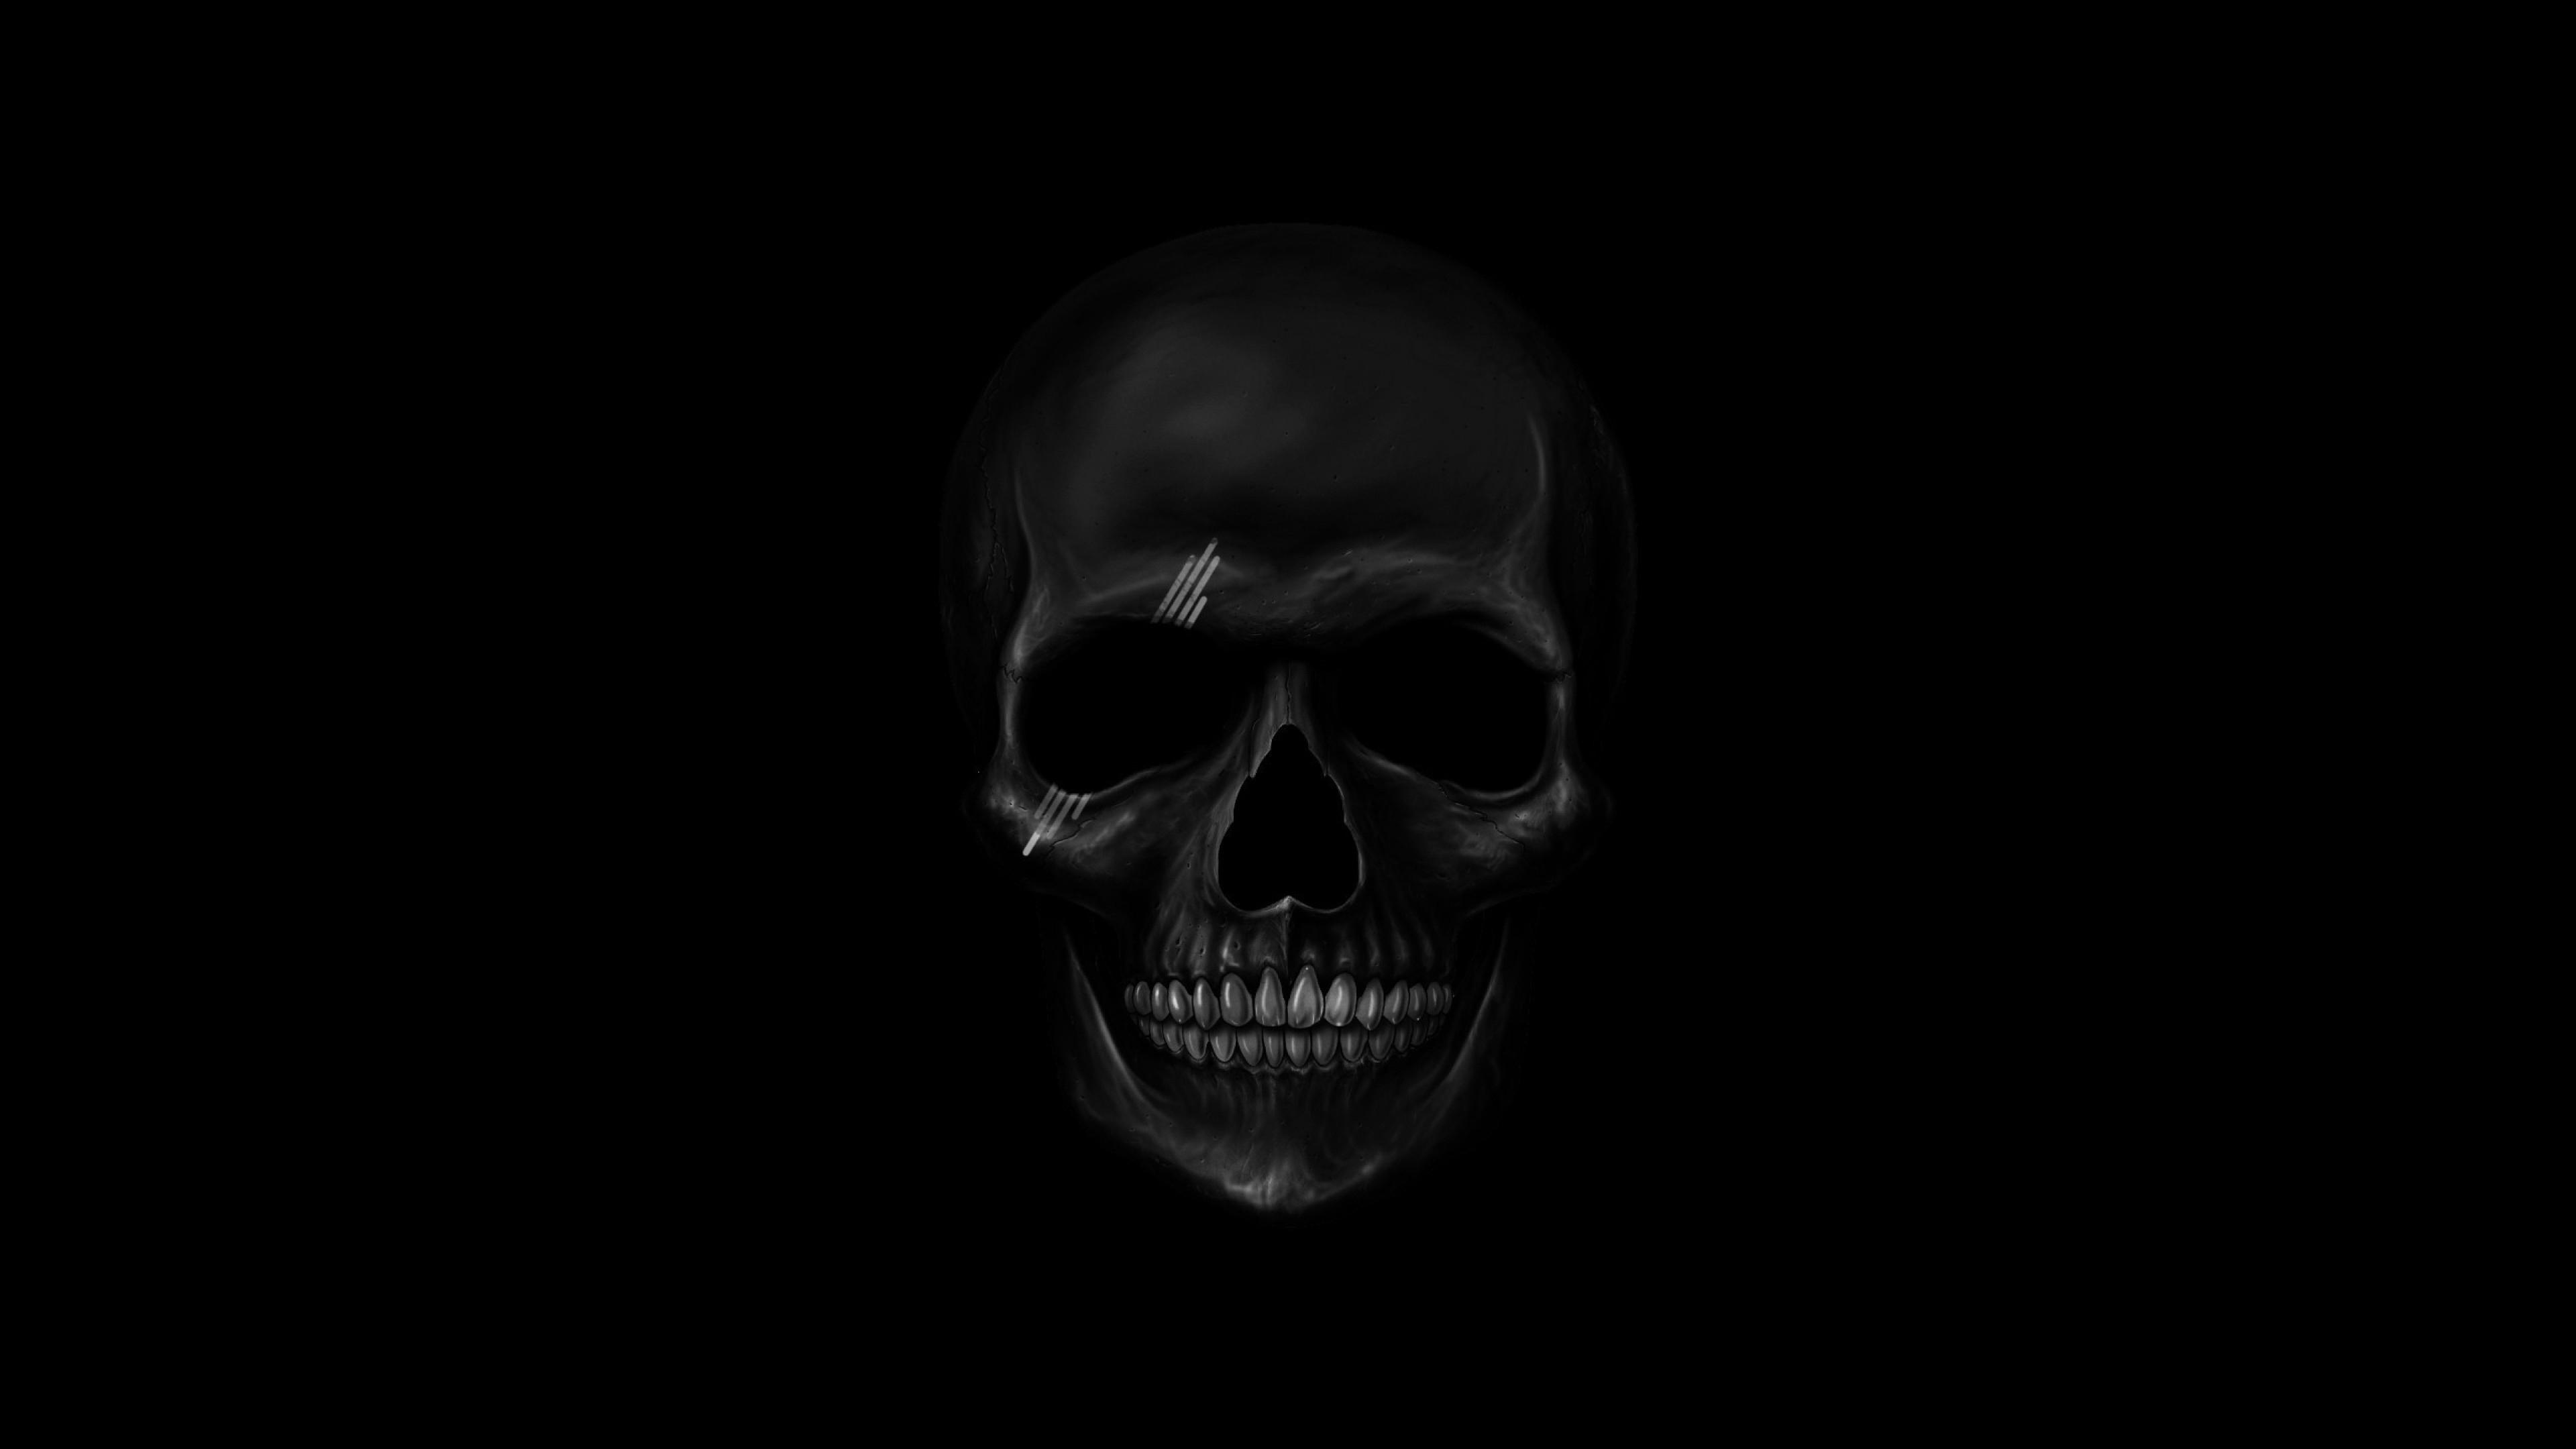 Skull And Bones 2018 Video Game 4k Hd Desktop Wallpaper: Skulls And Bones Wallpapers ·① WallpaperTag